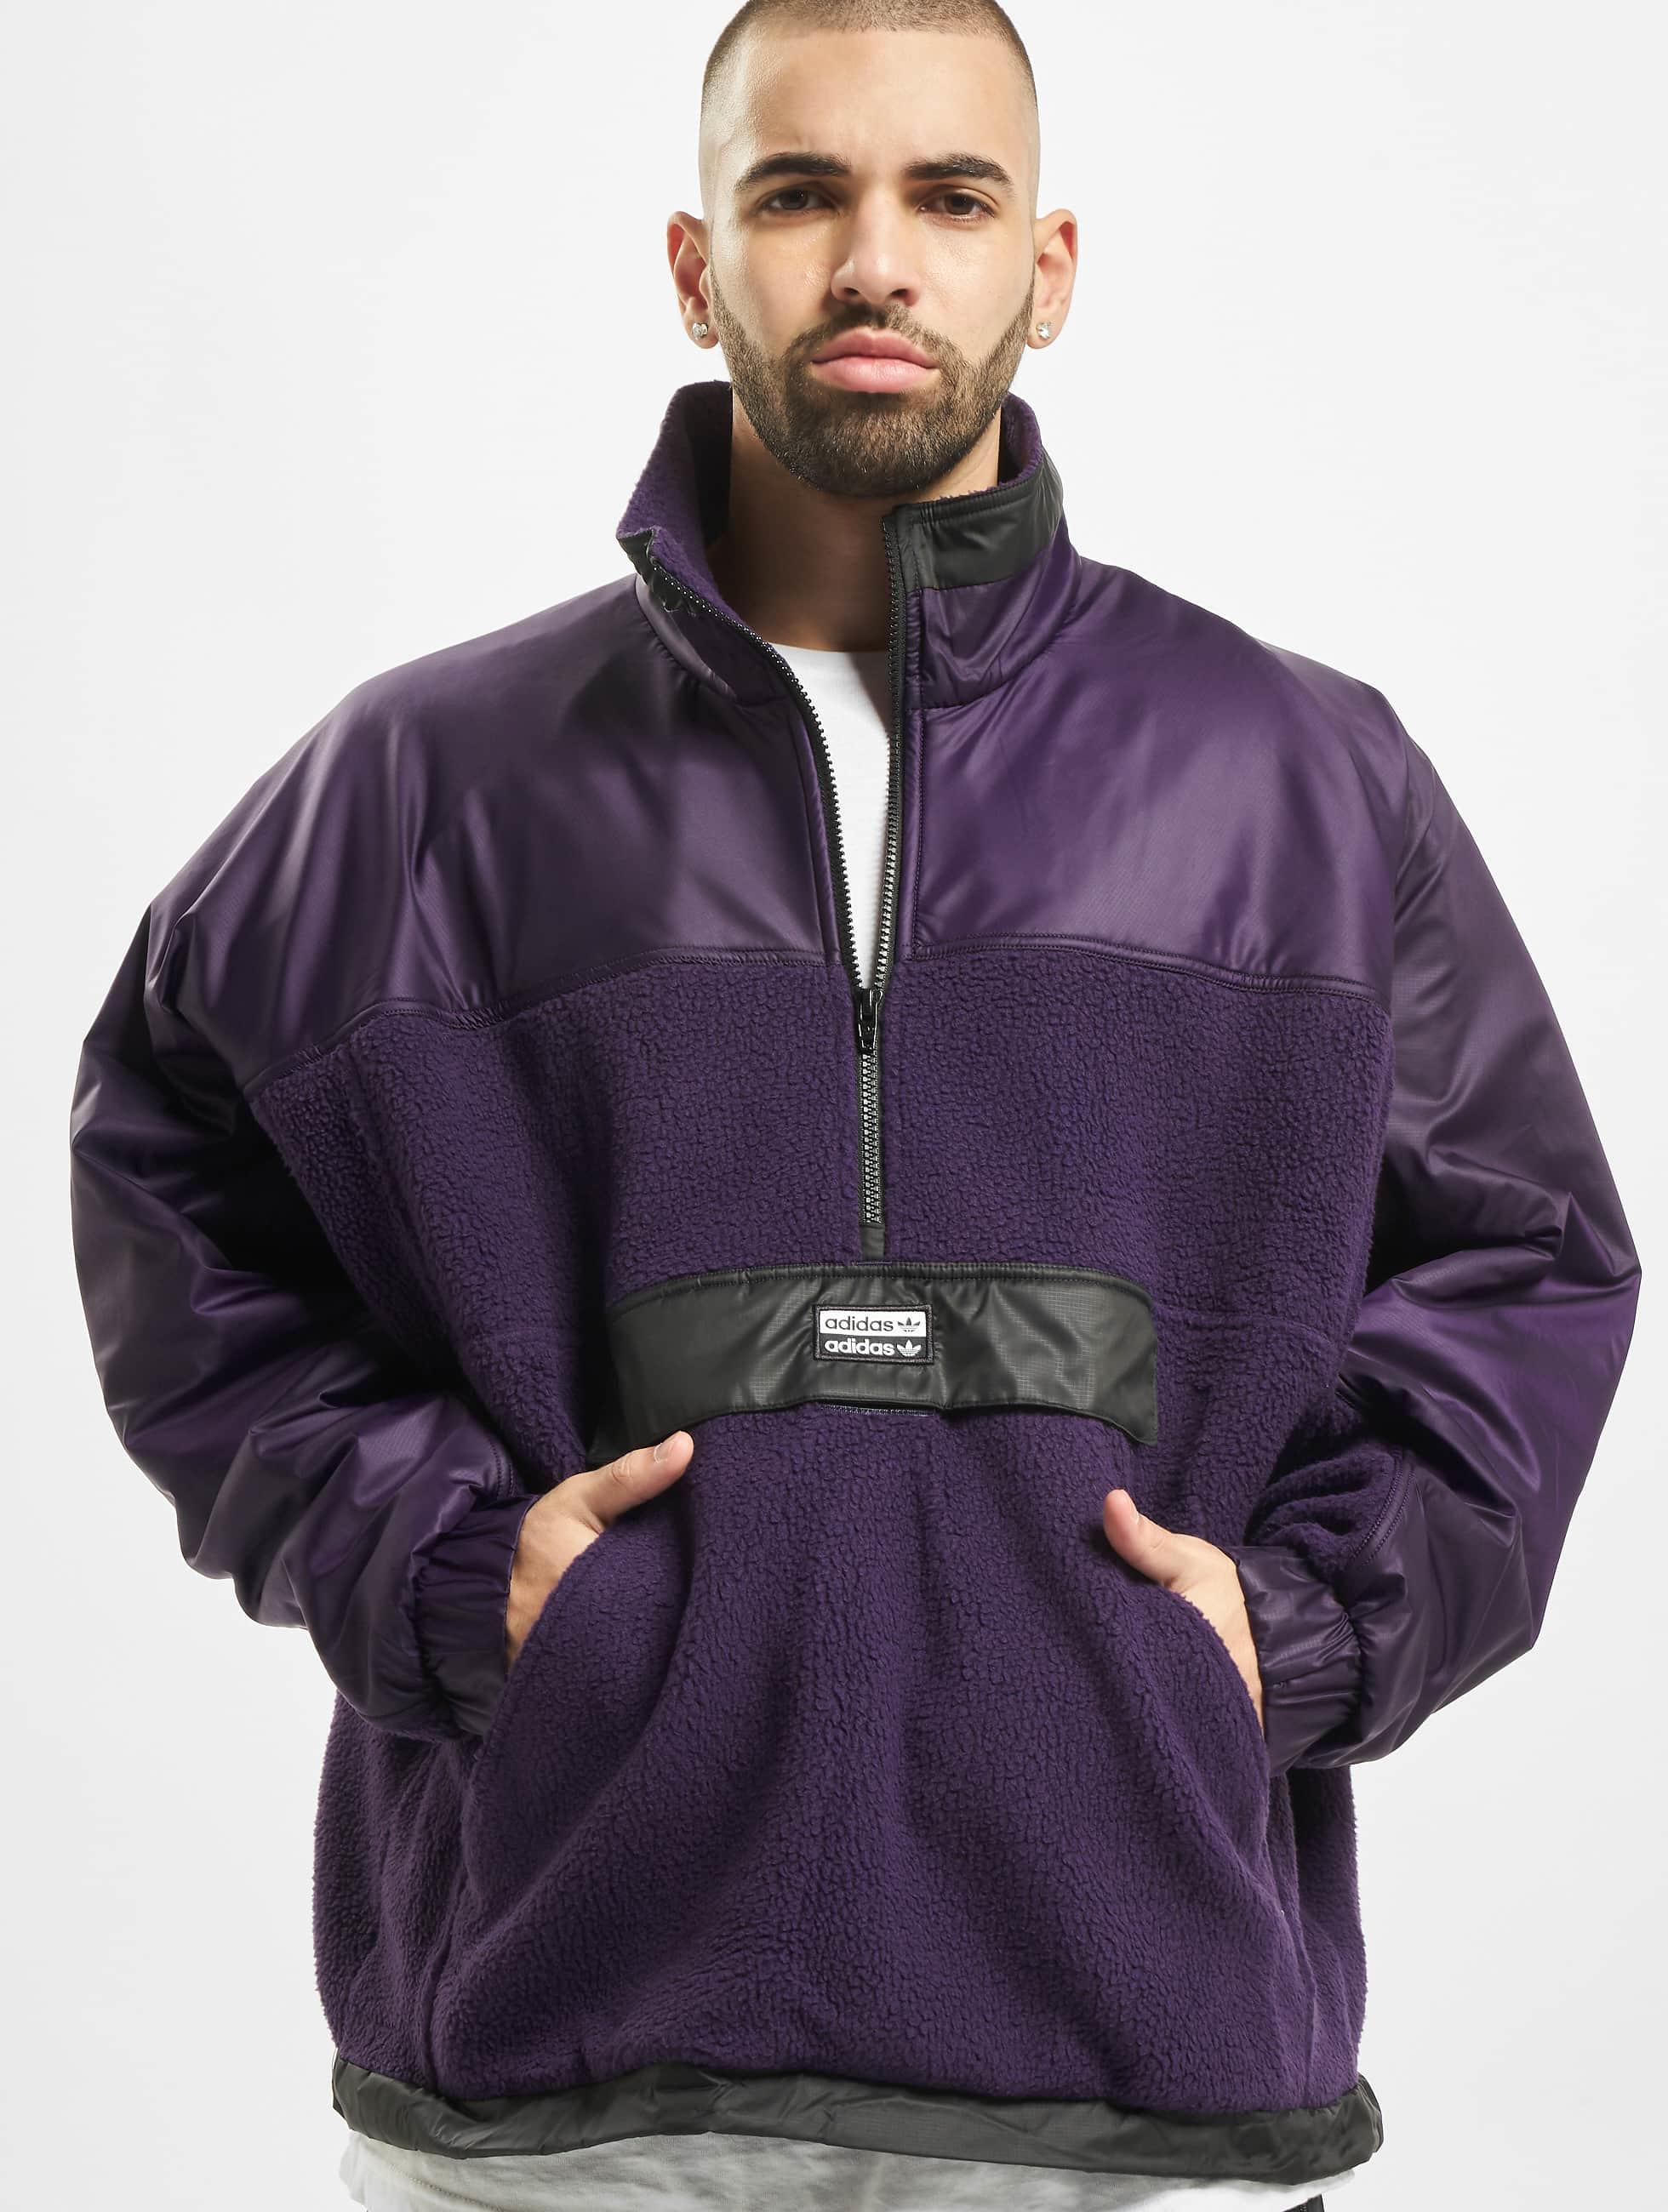 Adidas Originals R.Y.V. Lit Track Top Legend Purple